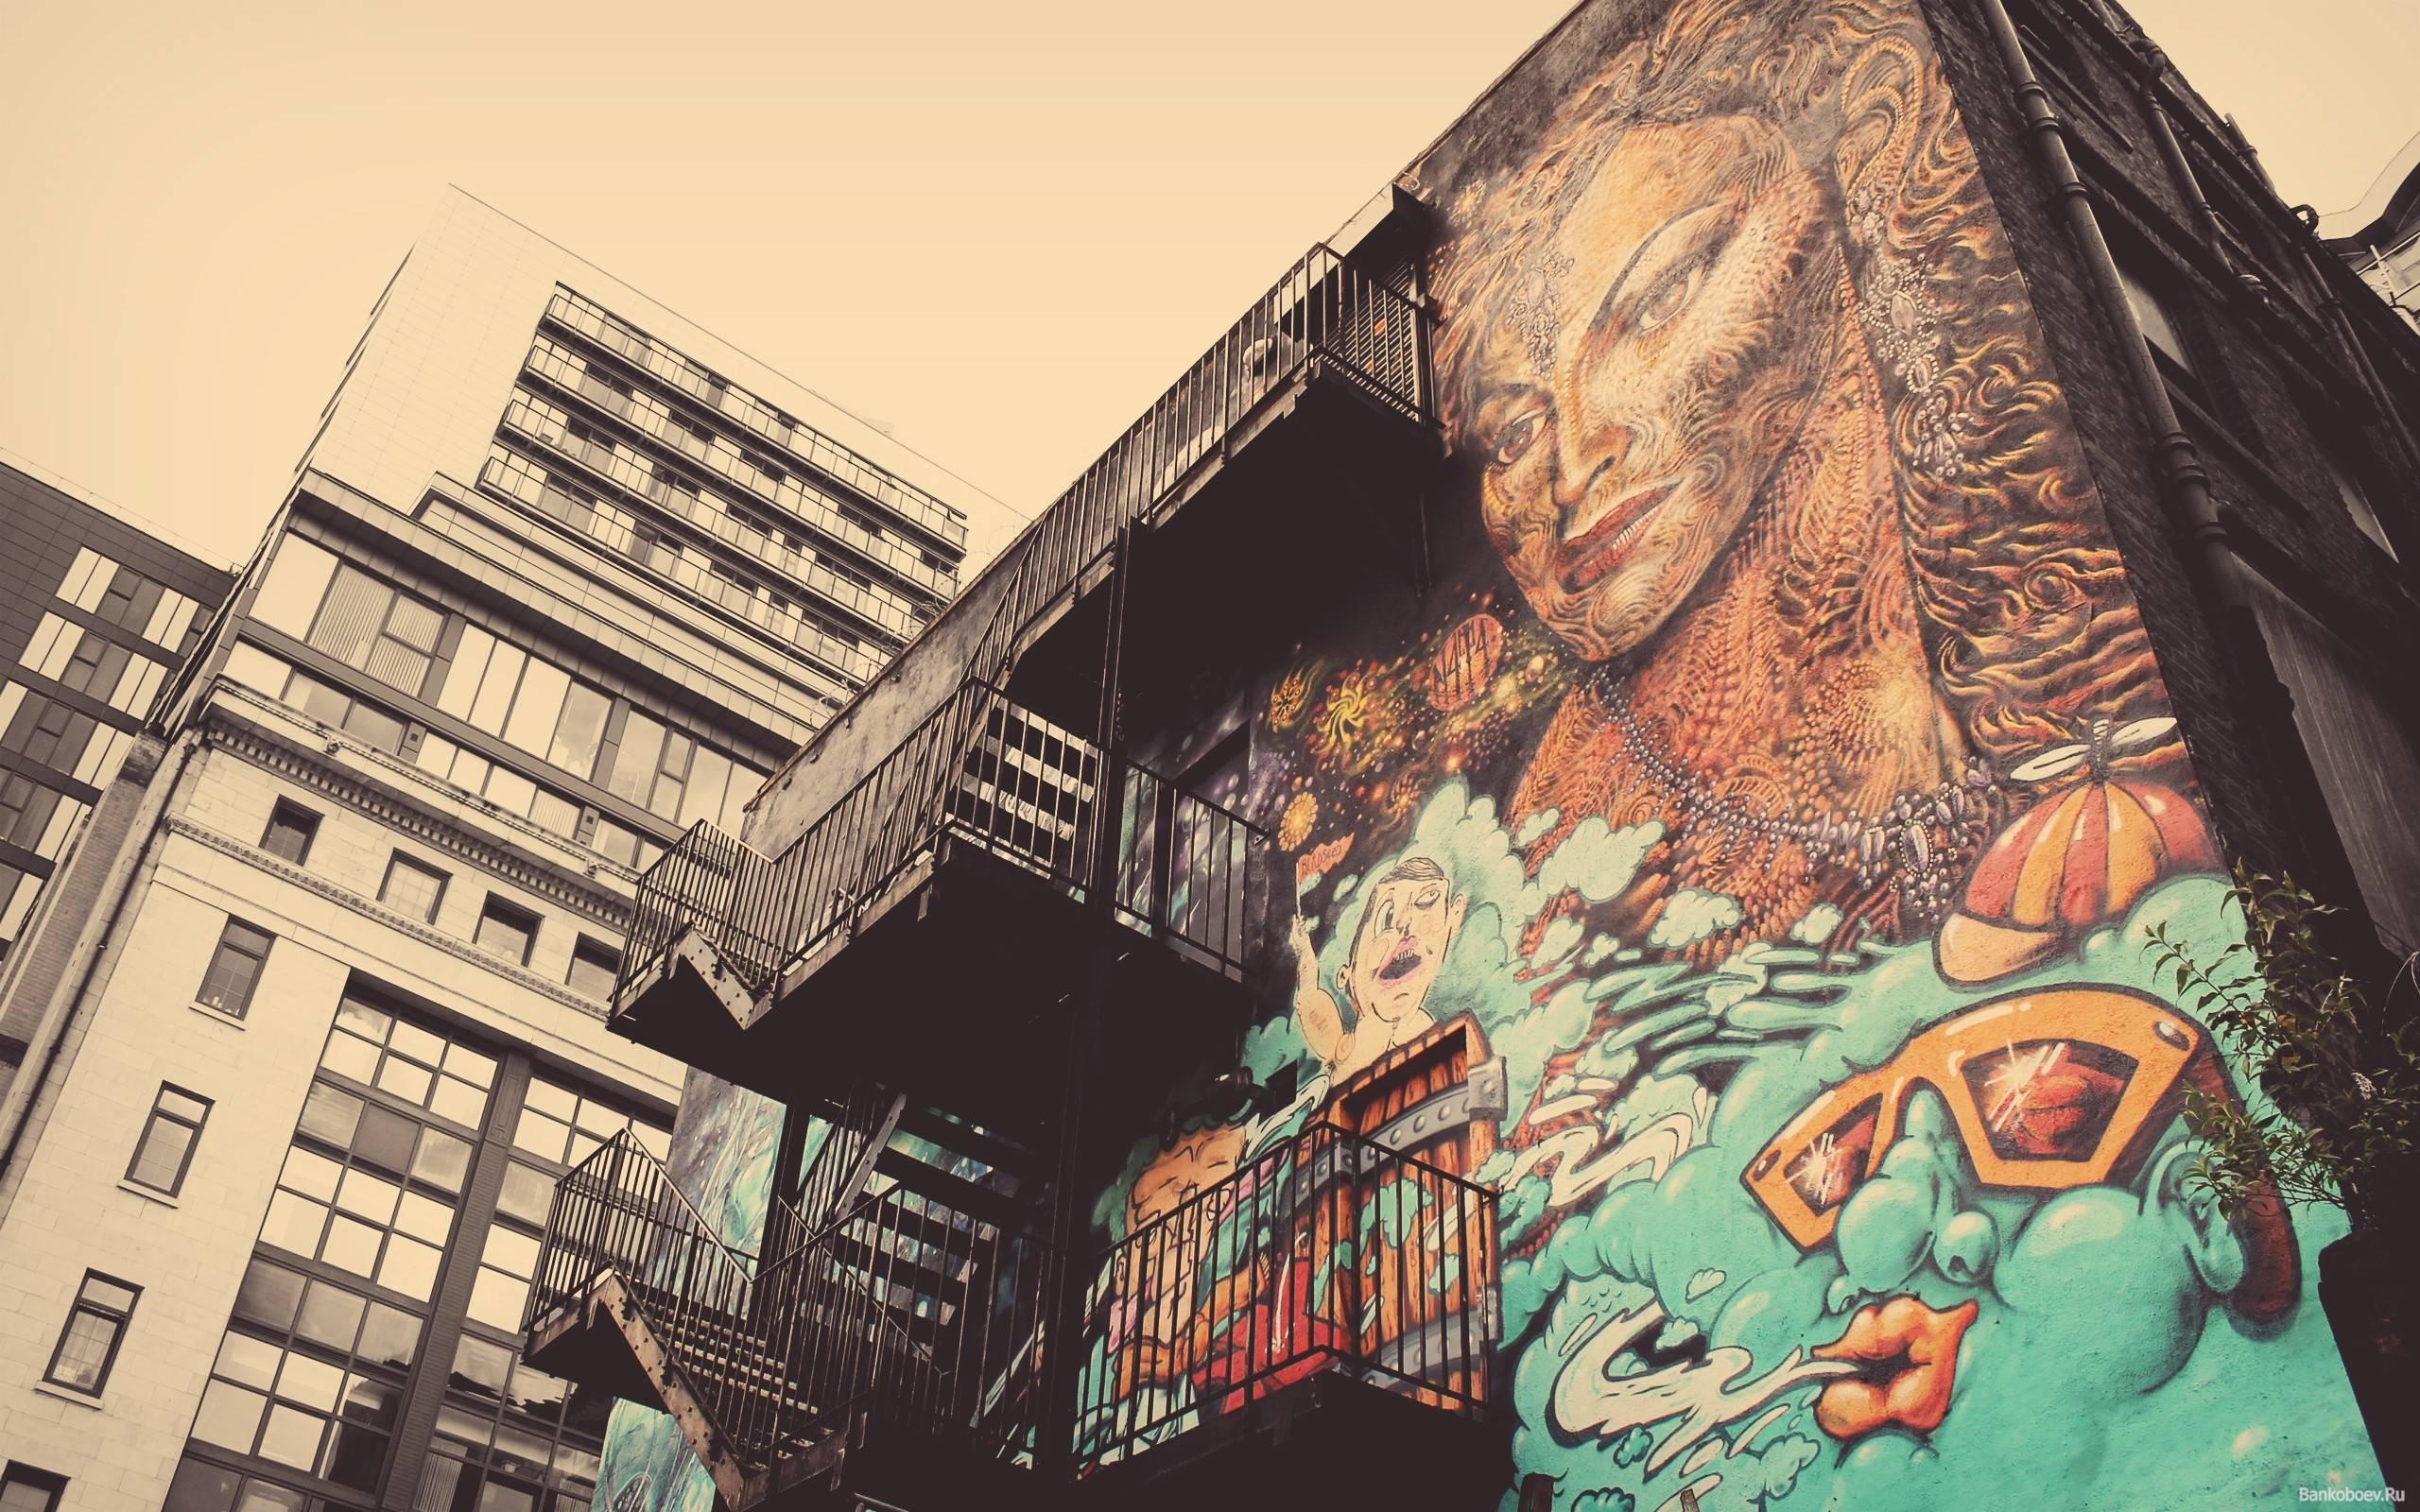 Tattoo Art Wallpapers Top Free Tattoo Art Backgrounds Wallpaperaccess